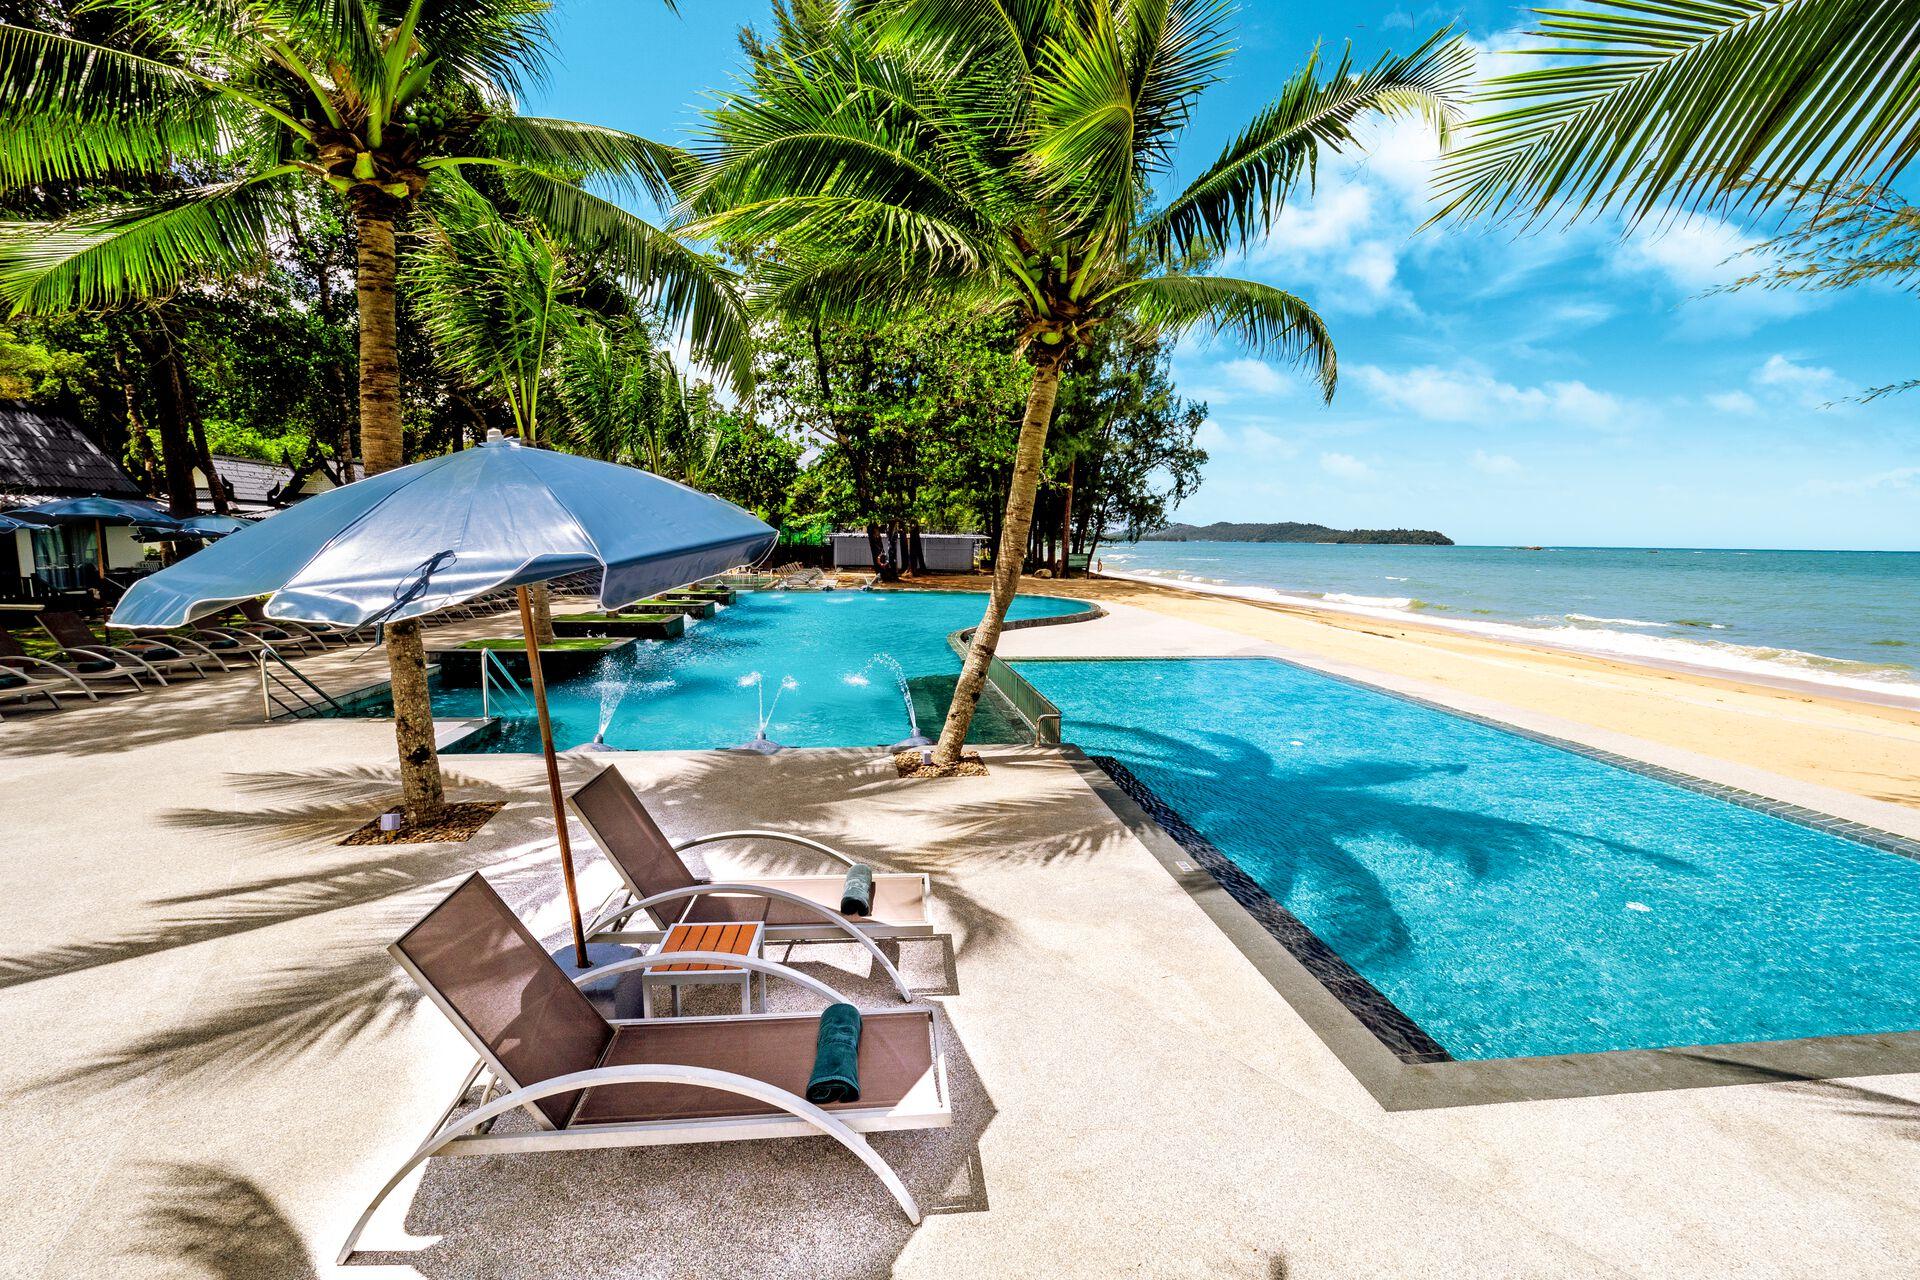 Hôtel Khaolak Emerald Beach Resort & Spa 4*